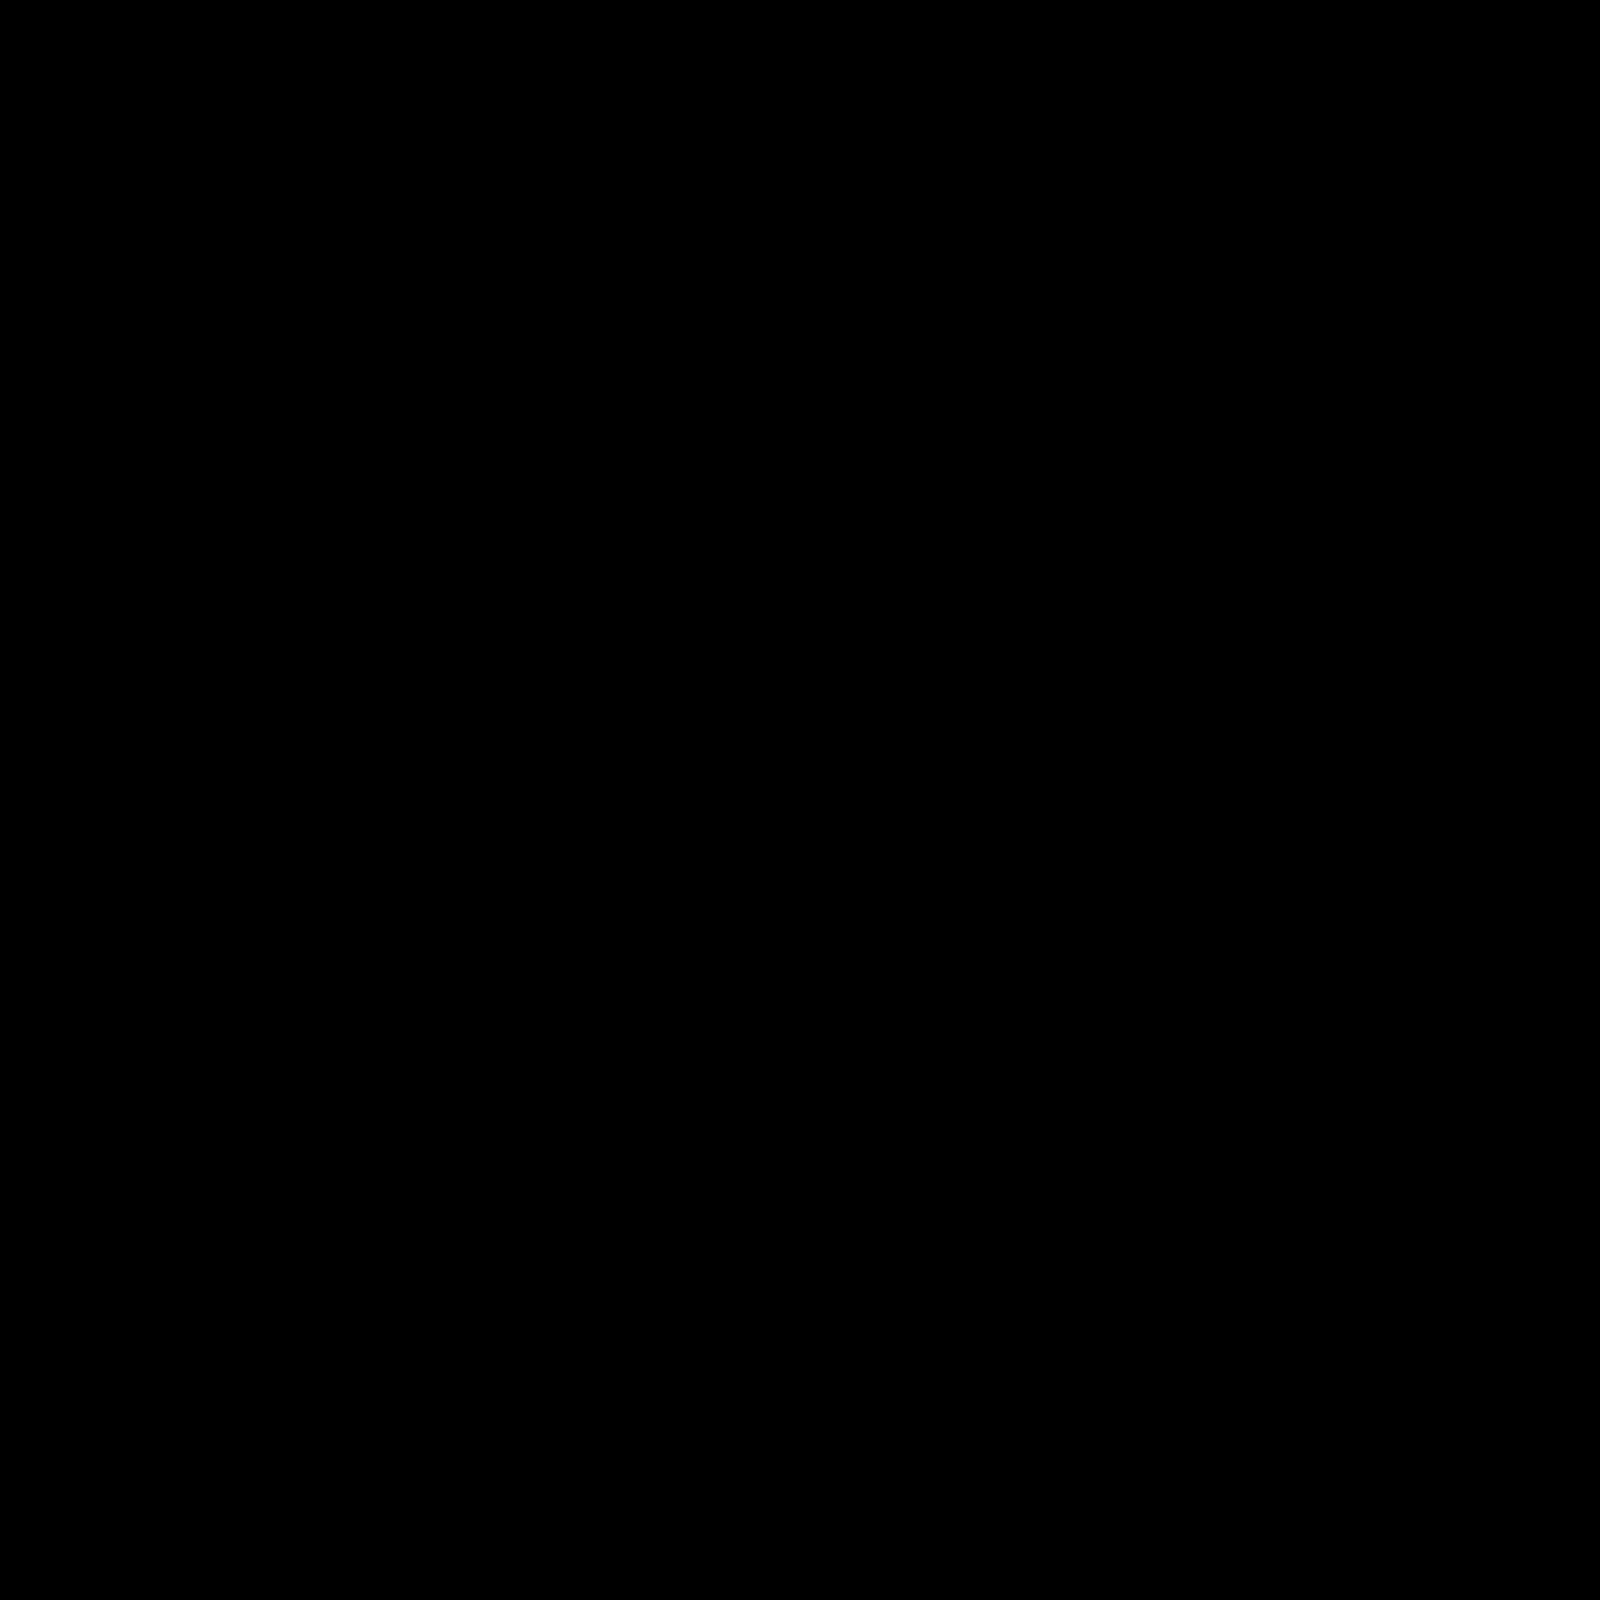 Frankensteins Monster Filled icon